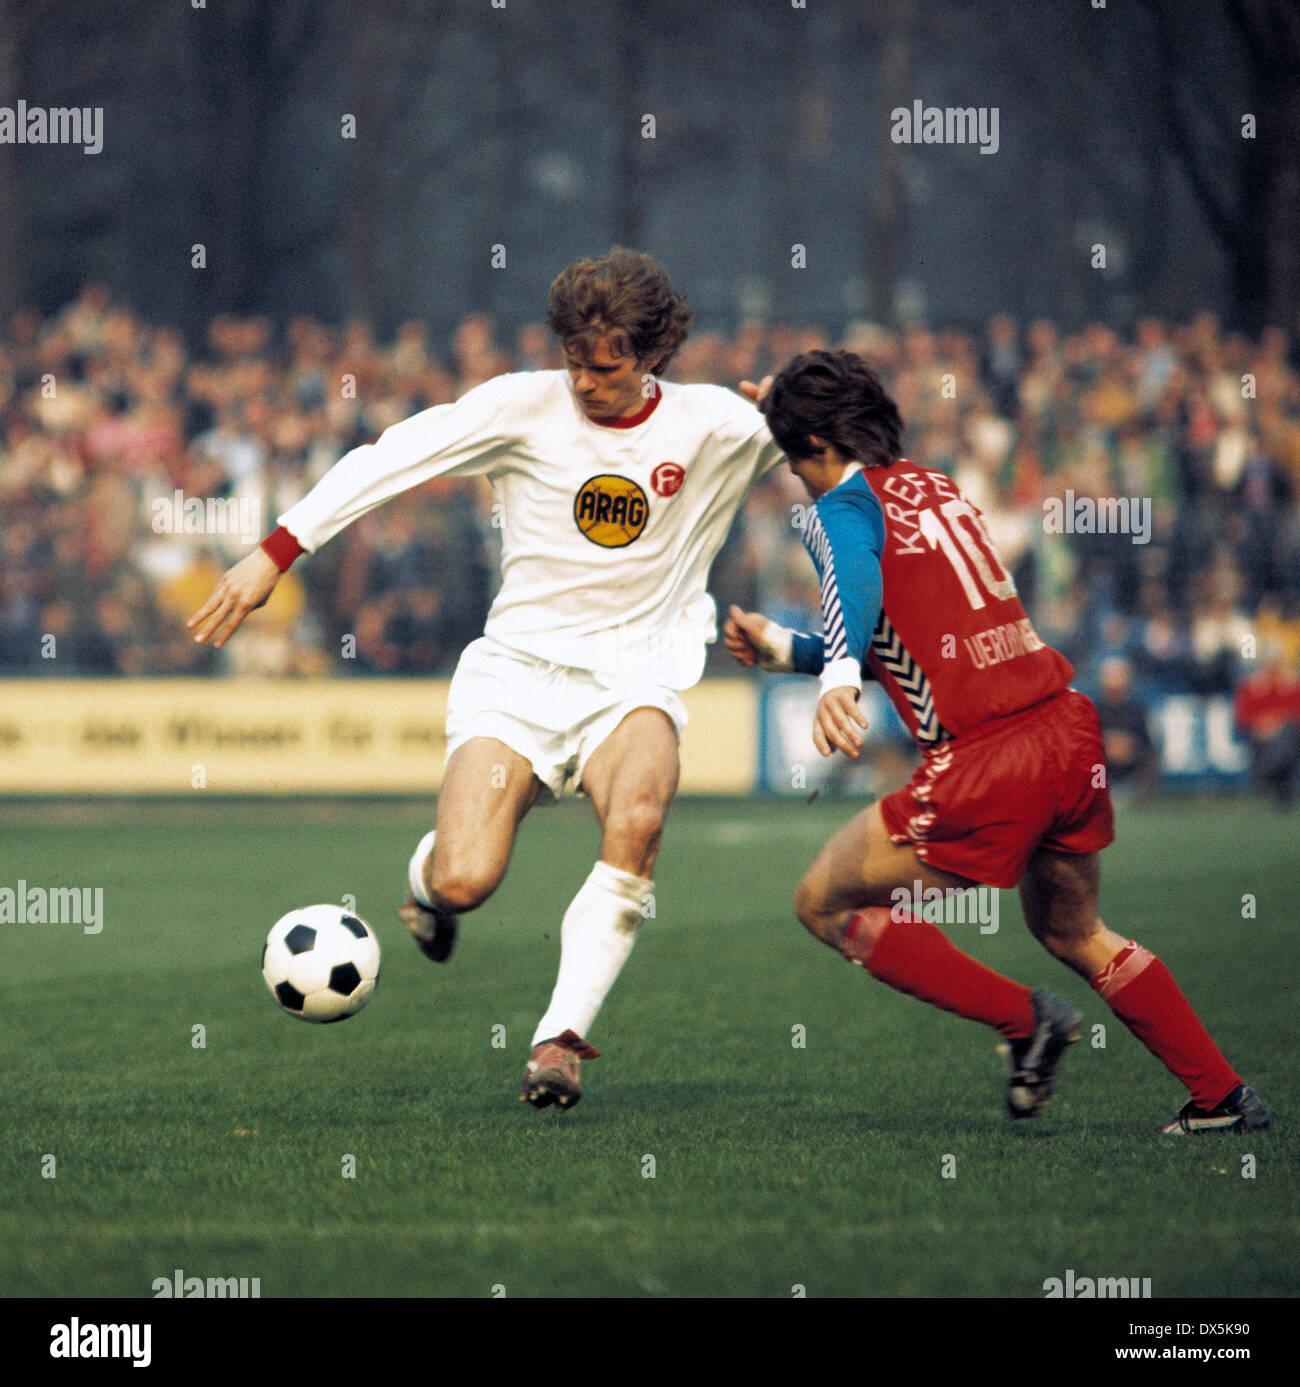 football, Bundesliga, 1975/1976, Grotenburg Stadium, FC Bayer 05 Uerdingen versus Fortuna Duesseldorf 2:0, scene of the match, Reiner Geye (Fortuna) and a player of Uerdingen - Stock Image